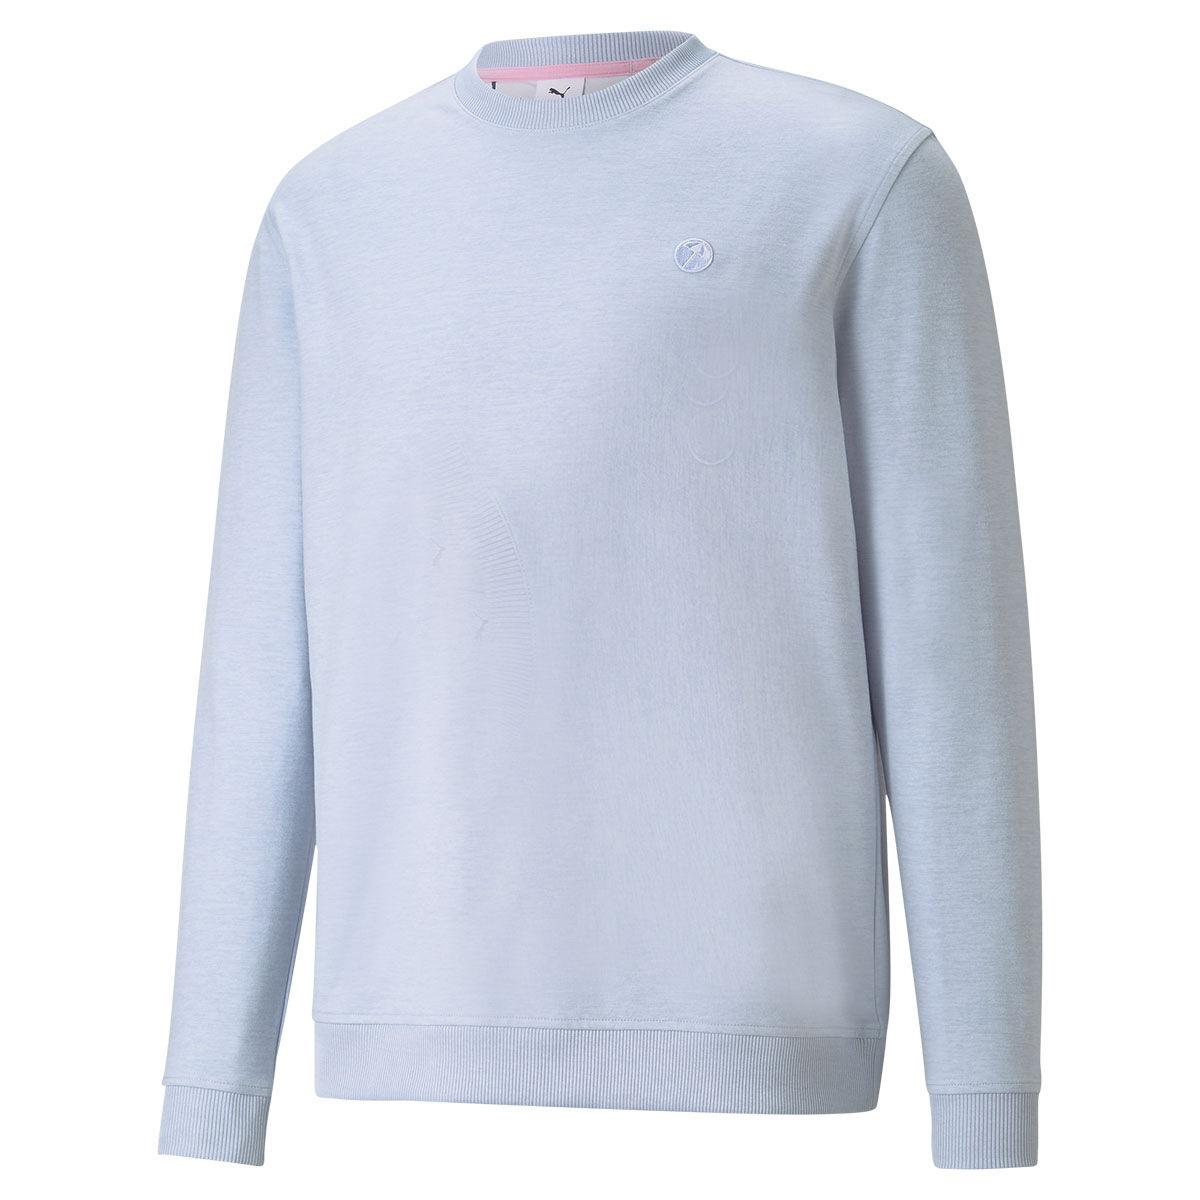 PUMA Golf AP Cloudspun Golf Sweater, Mens, Large, Halogen blue heather | American Golf